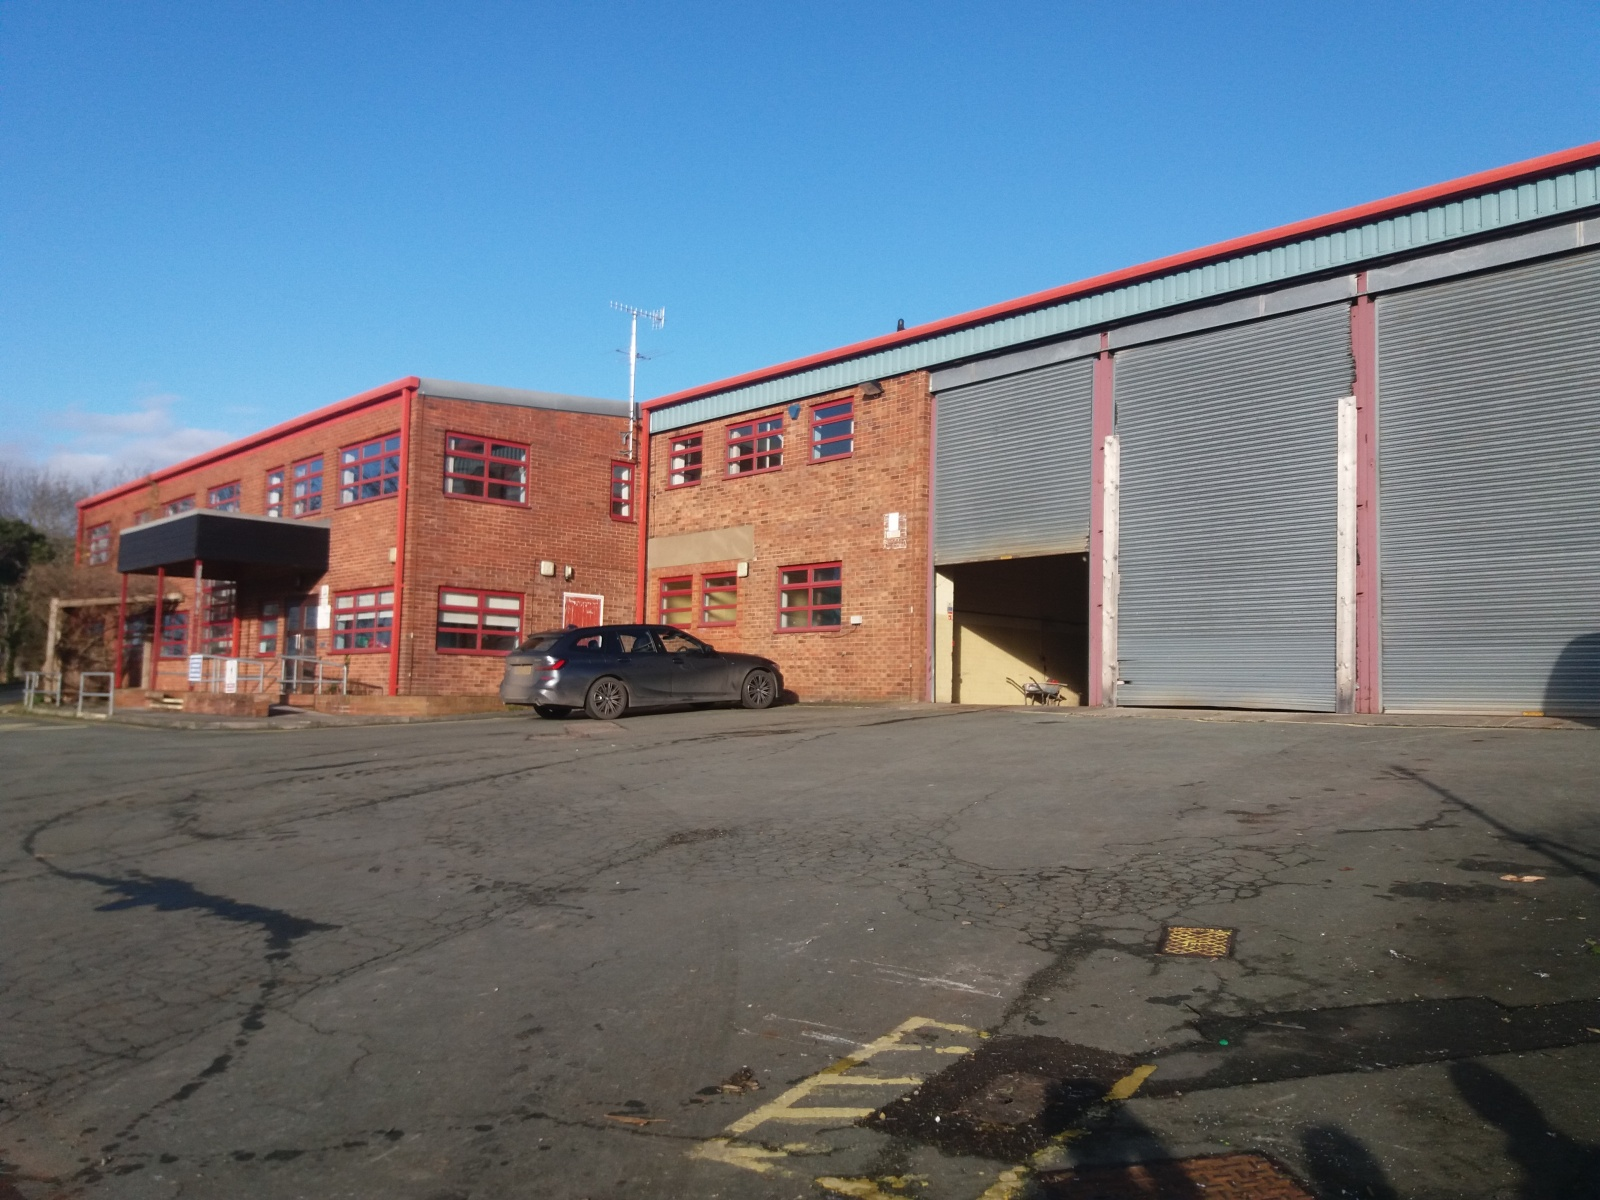 Former Cae Post Premises, Criggion Lane, Trewern, Nr Welshpool, Powys